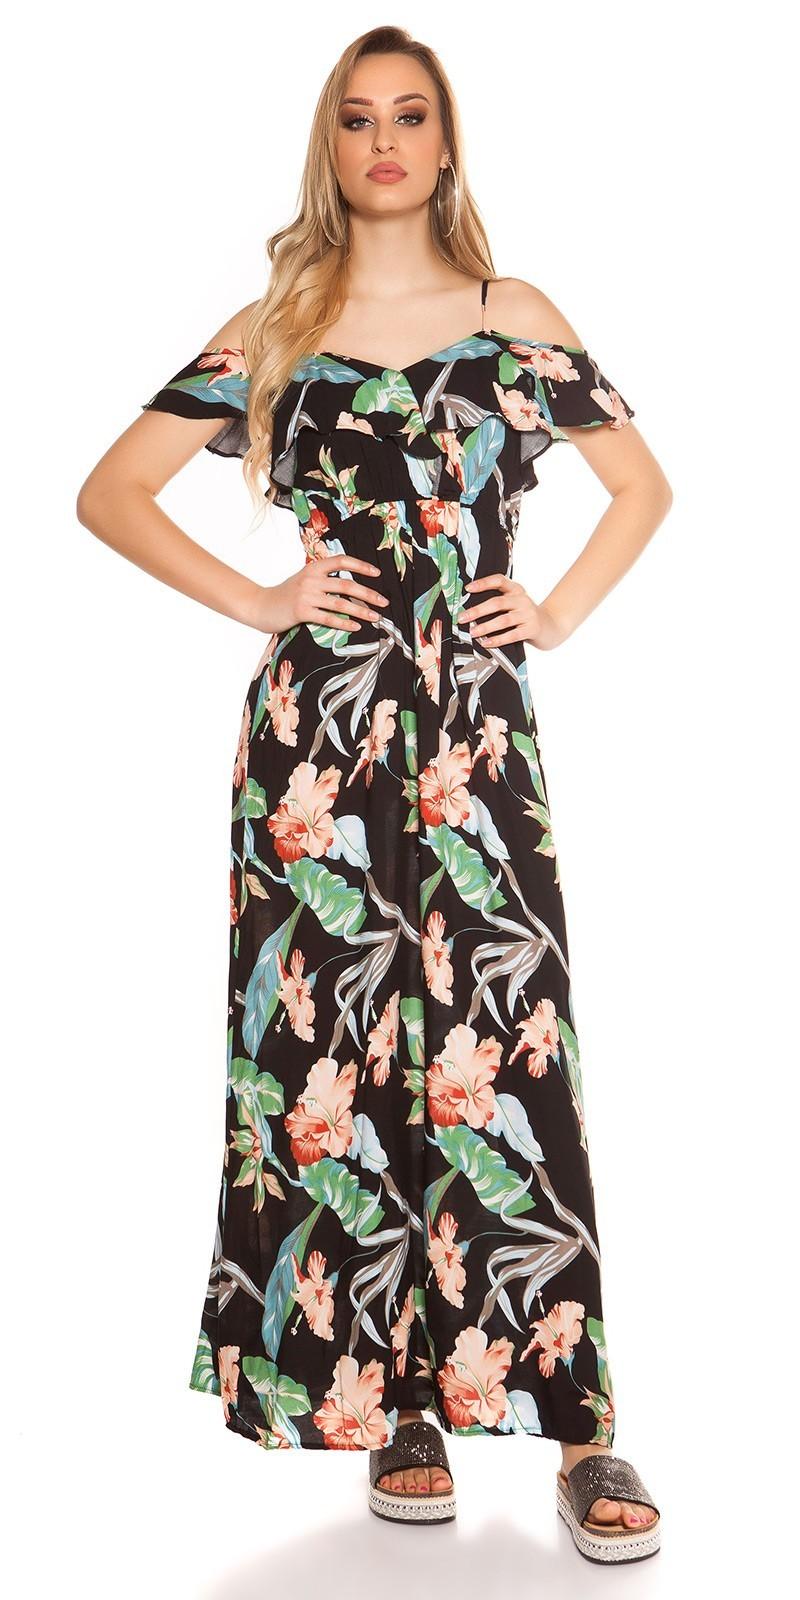 7ae7c65268c9 Kvetované dlhé letné šaty Coachella-style Black – Sissy Boutique